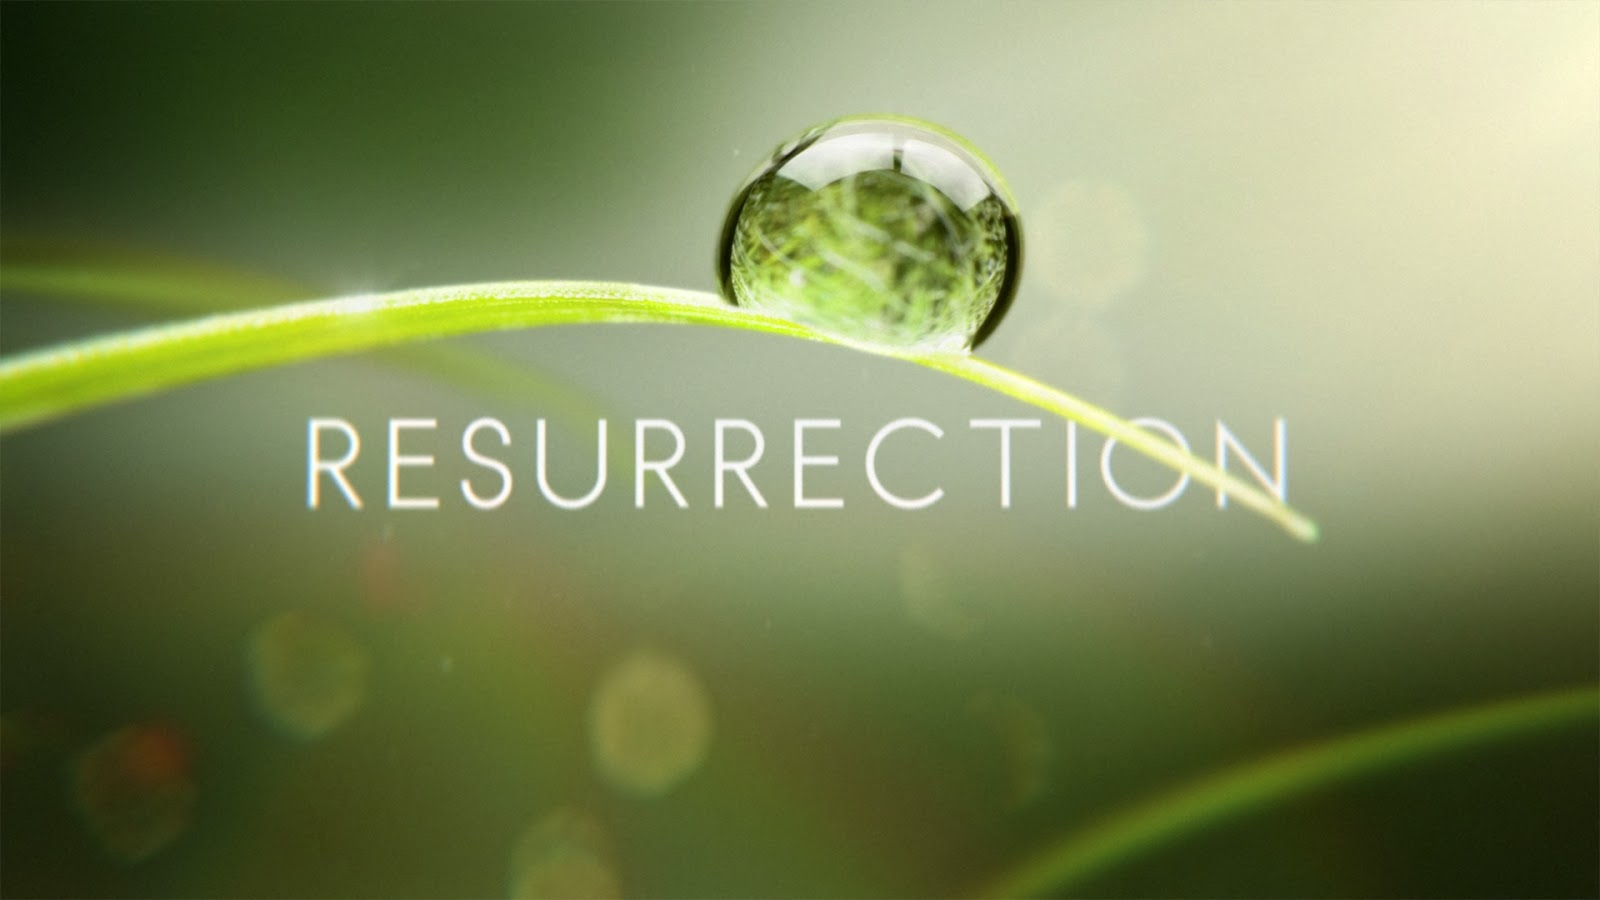 Resurrection (2014) 2x13 V.O. Disponible